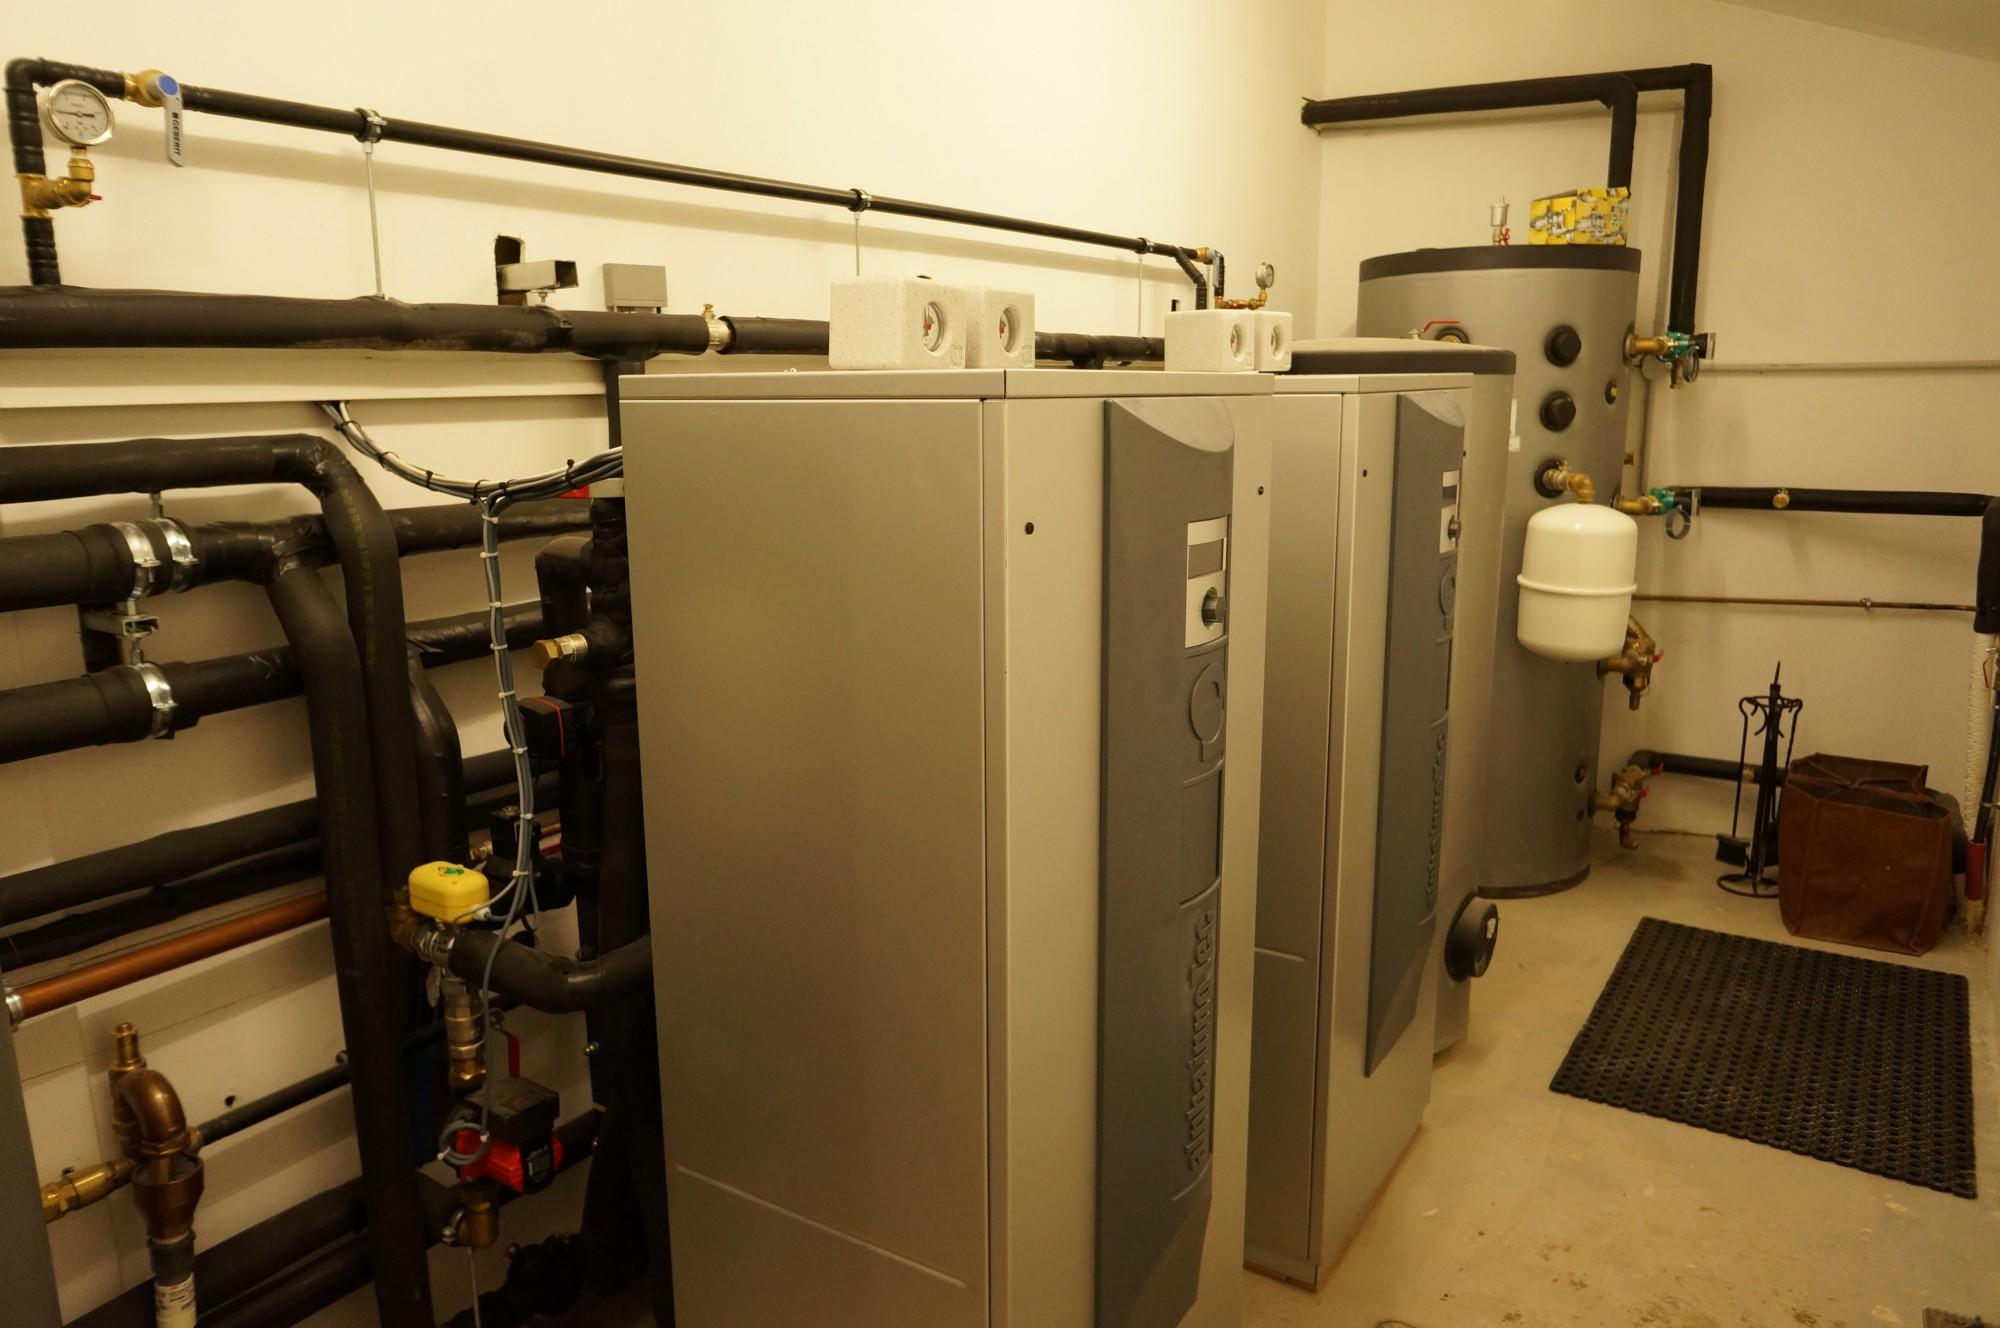 installation pompe chaleur alpha innotec mallemort installation et d pannage climatisation. Black Bedroom Furniture Sets. Home Design Ideas